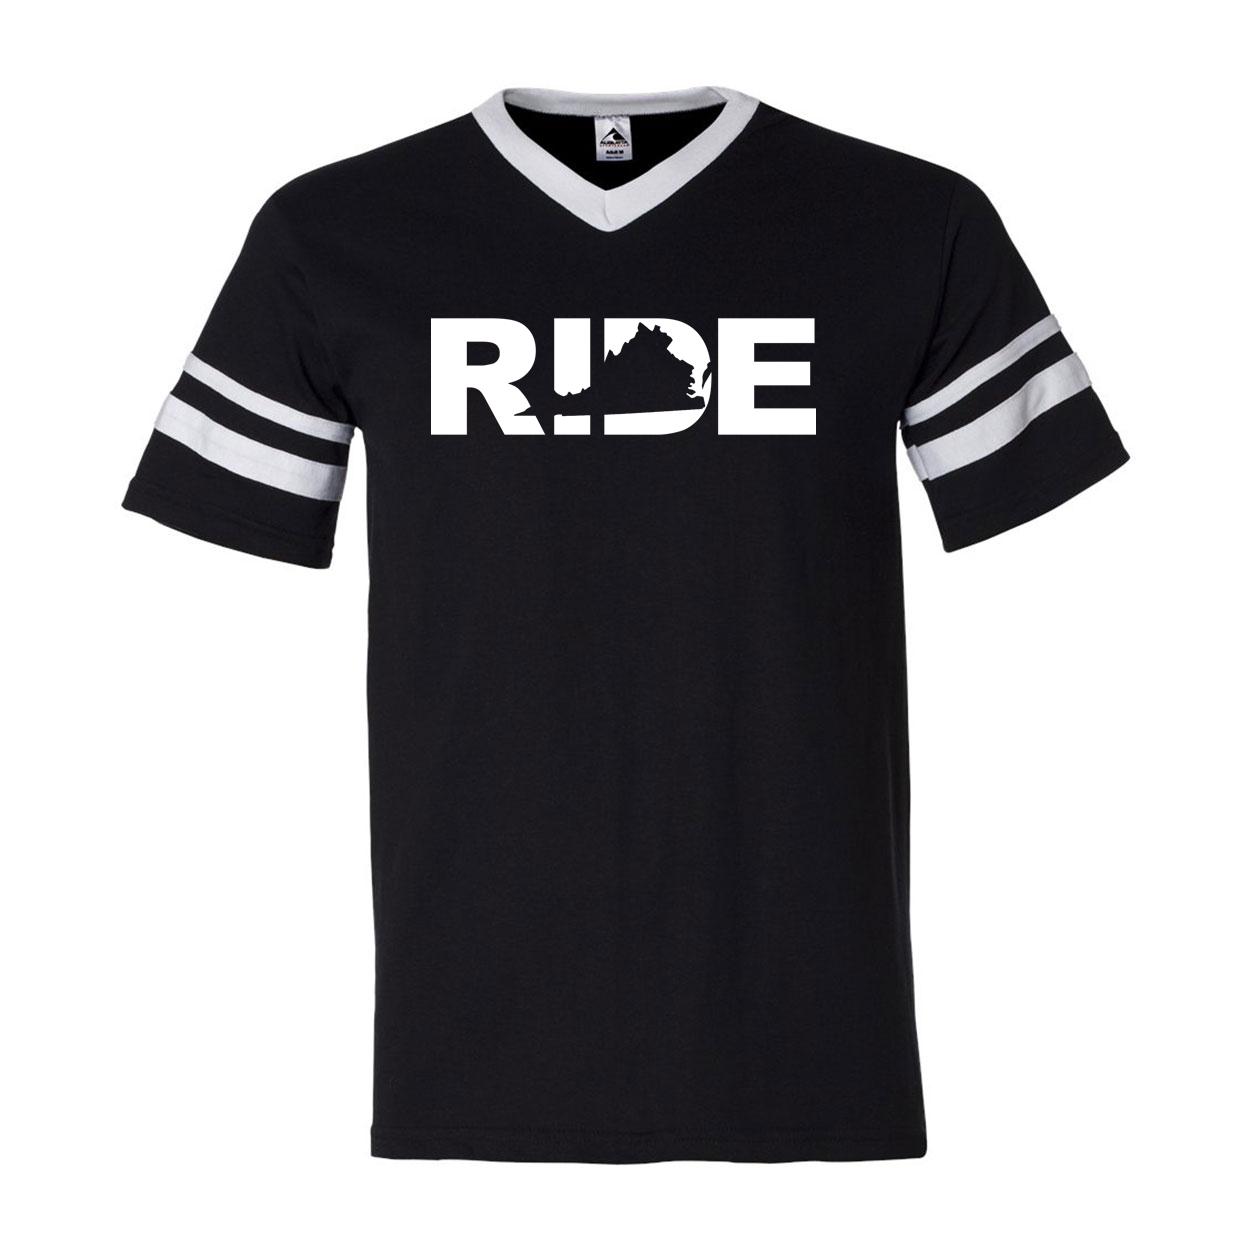 Ride Virginia Classic Premium Striped Jersey T-Shirt Black/White (White Logo)